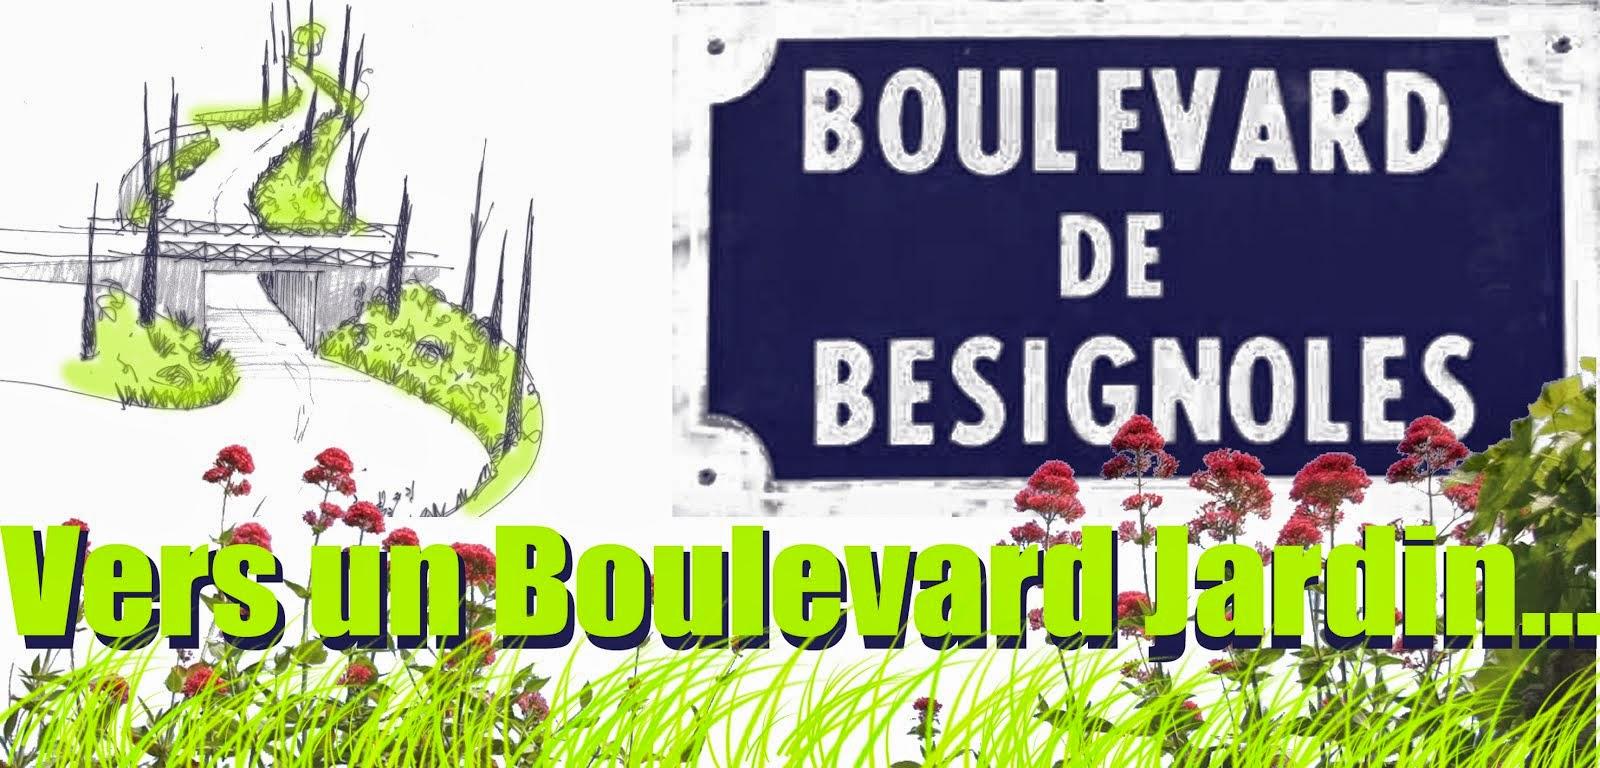 Boulevard de b signoles vers un boulevard jardin for Boulevard du jardin botanique 20 22